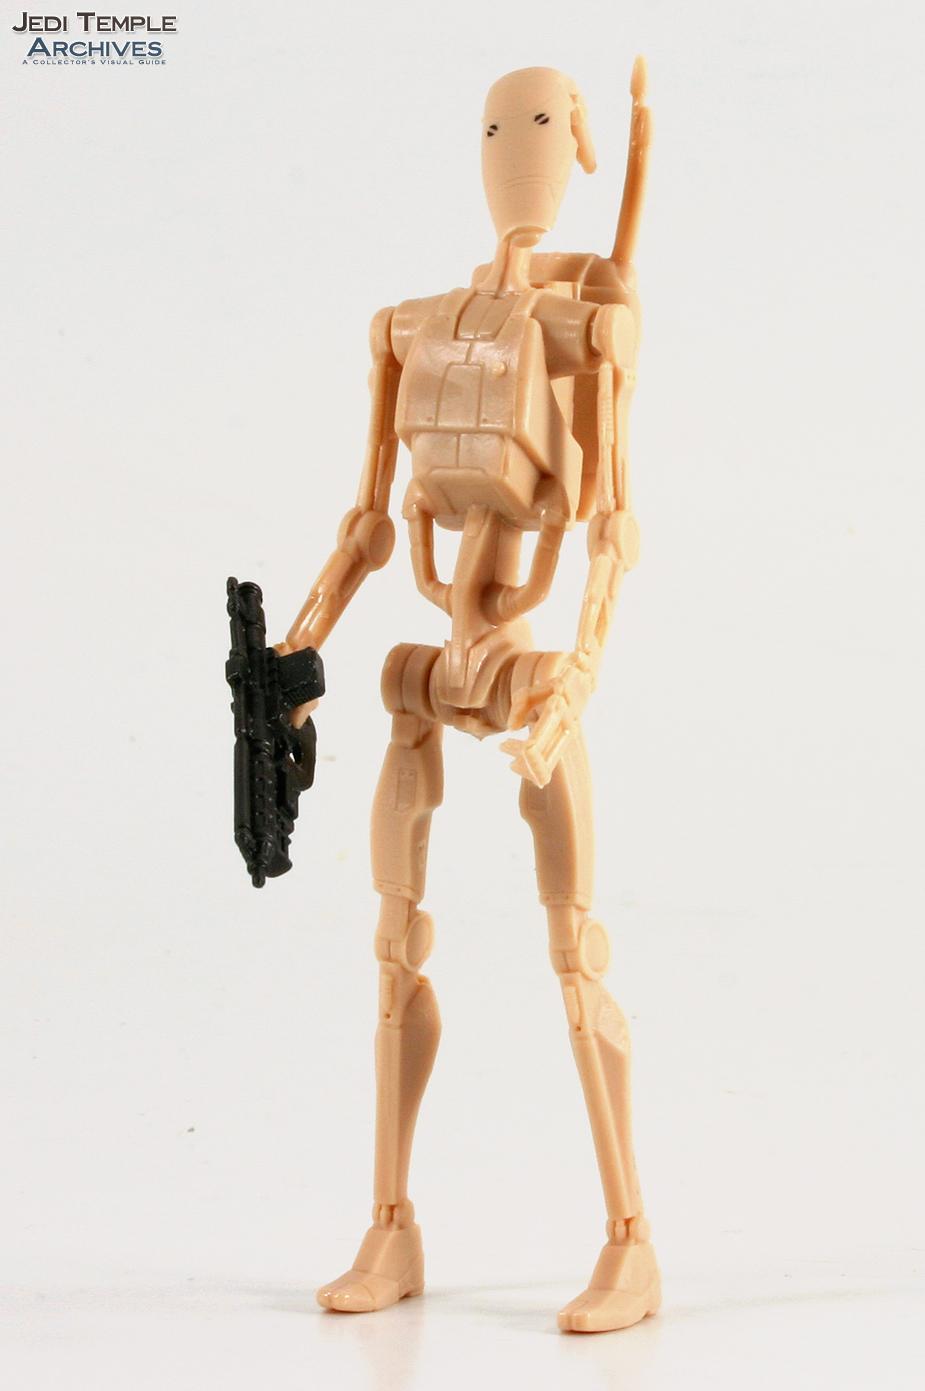 Battle Droid (articulated) | Trade Federation MTT (Multi-Troop Transport)